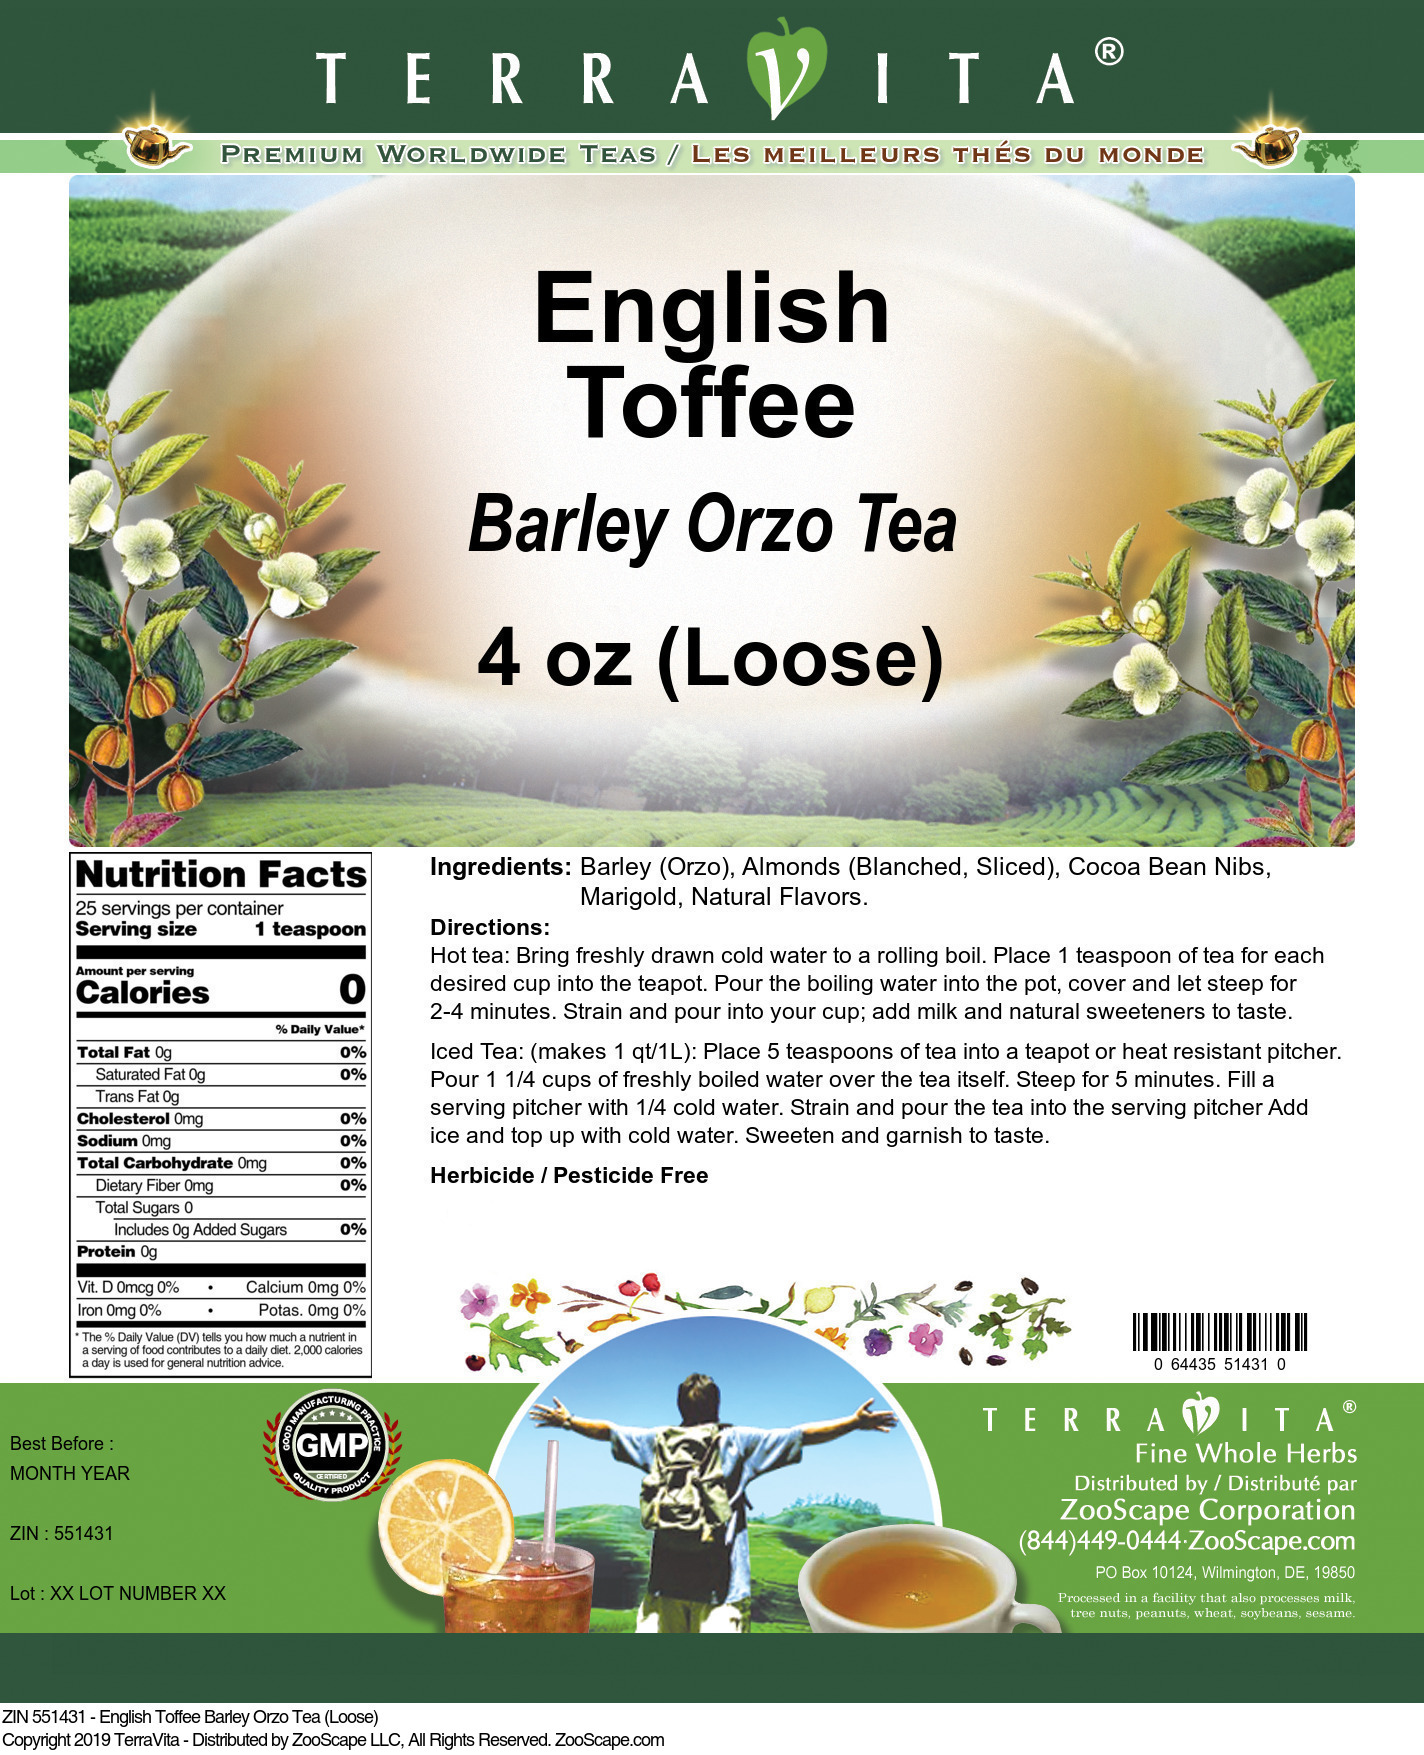 English Toffee Barley Orzo